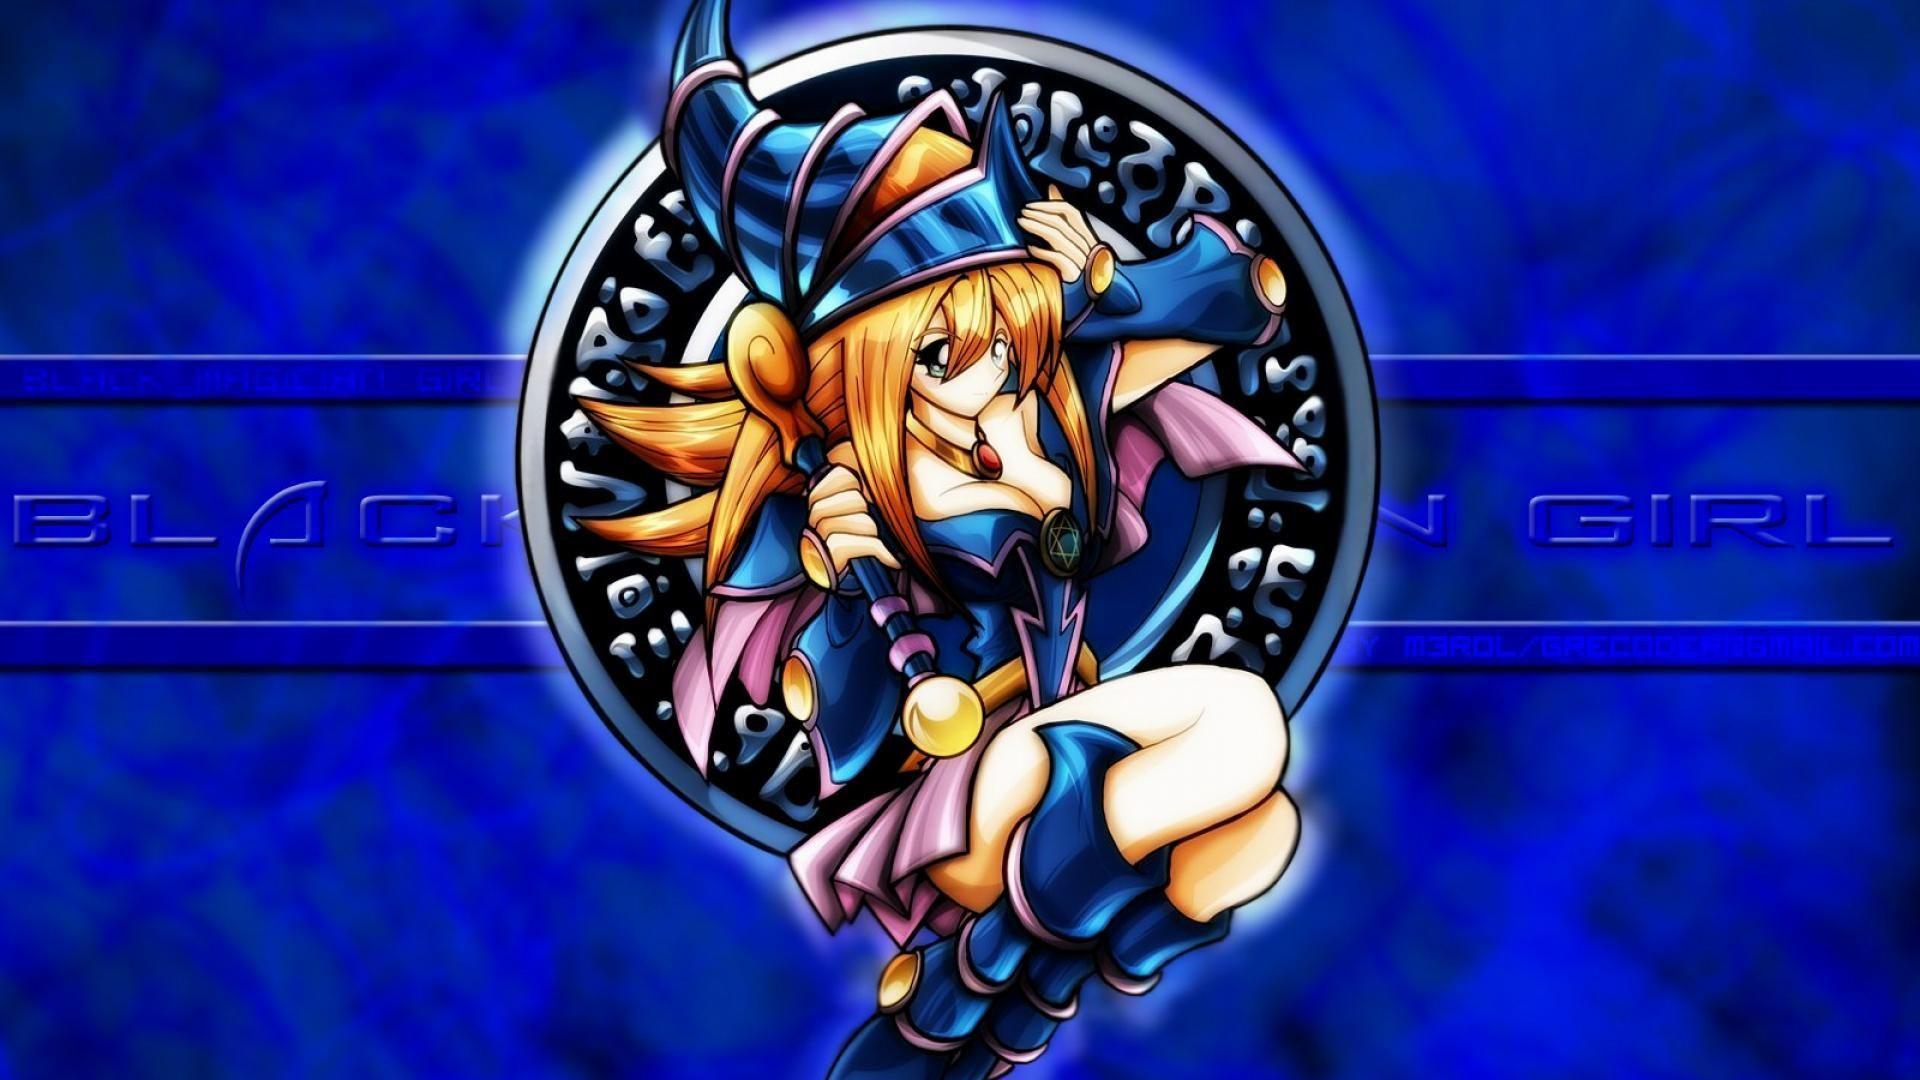 Millenium Ring Yu Gi Oh Anime Background Wallpapers On Desktop